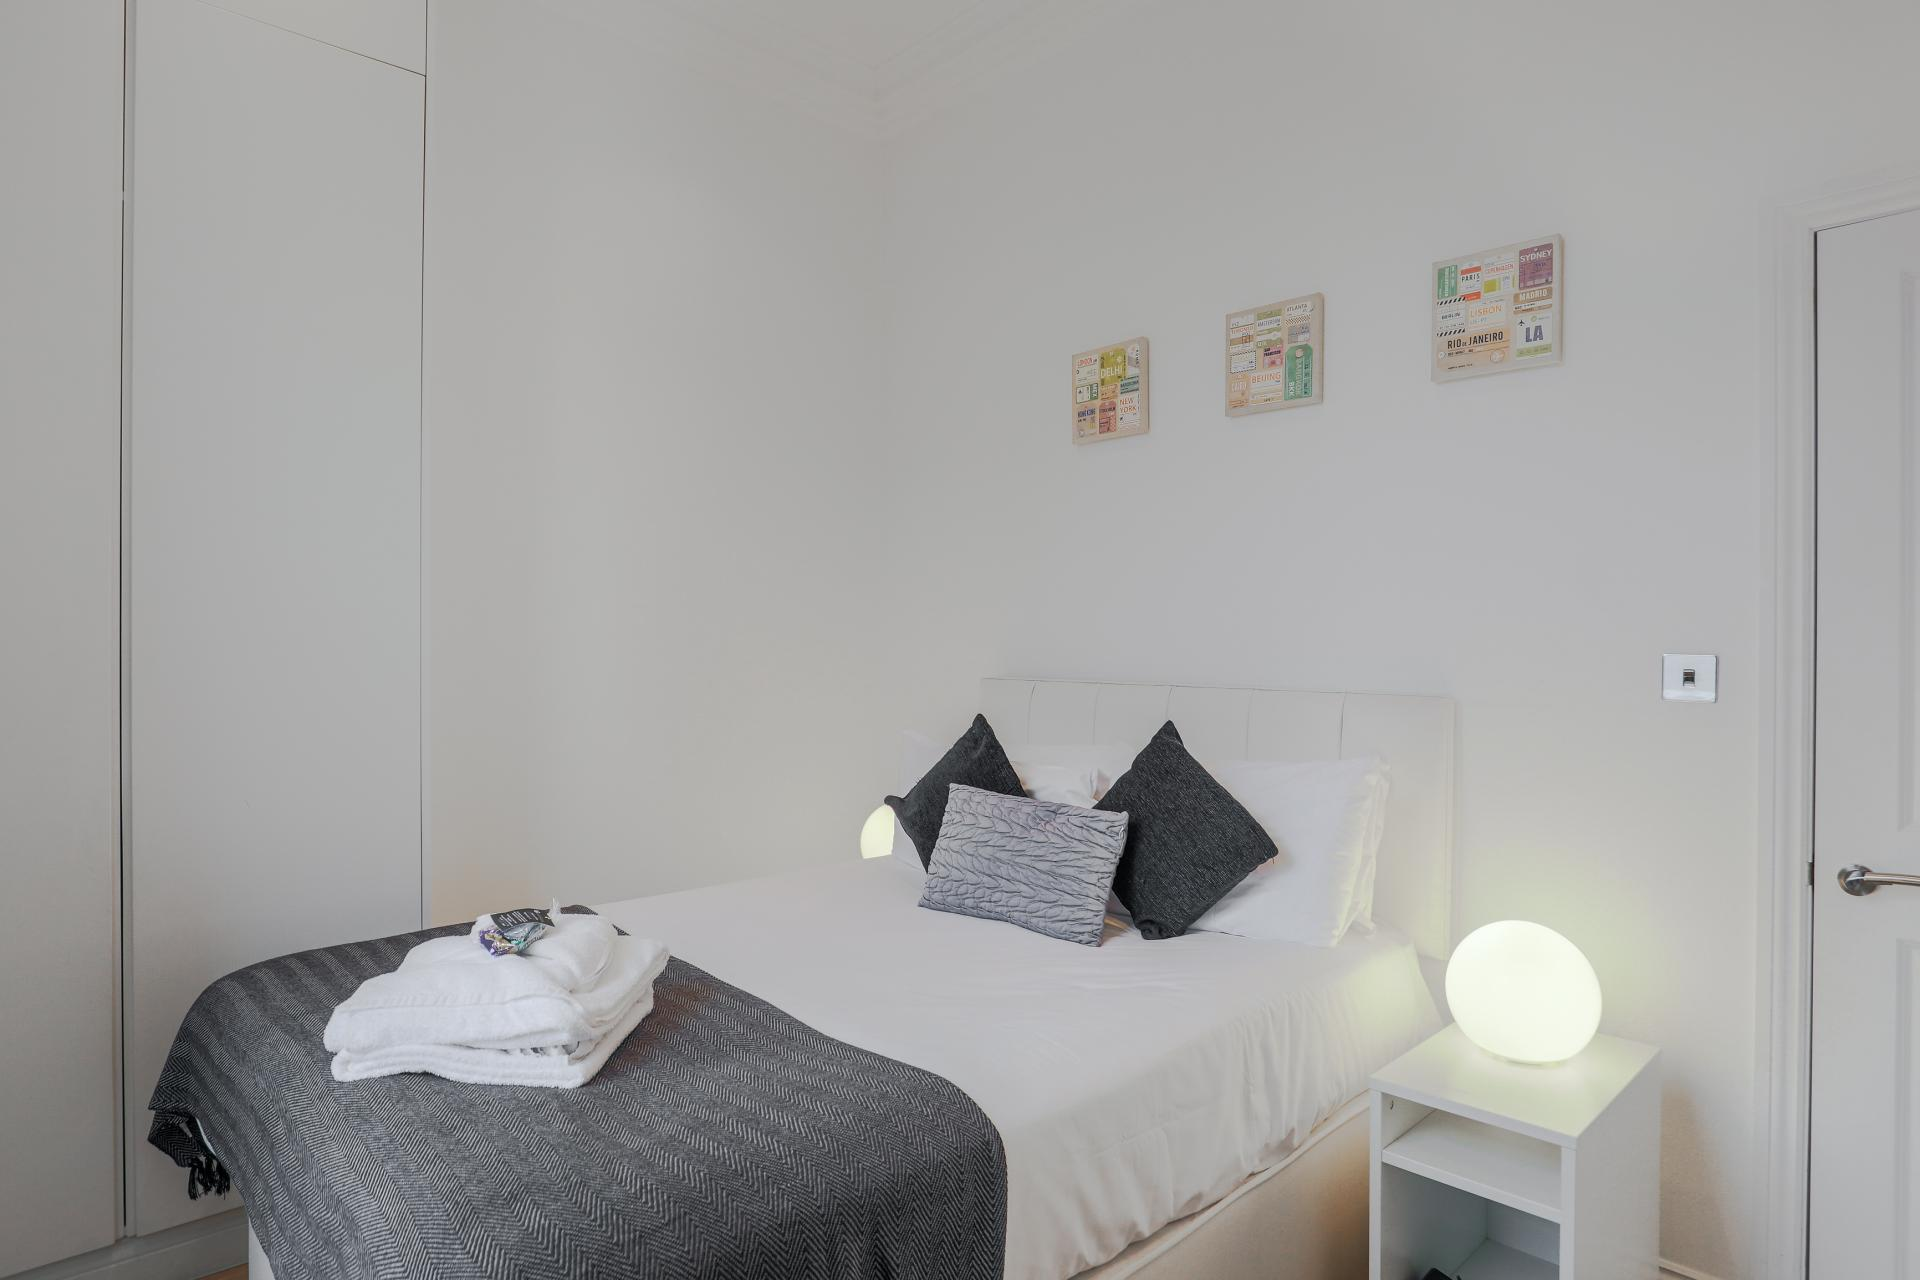 Bed at Notting Hill Ladbroke Grove Apartments, Ladbroke Grove, London - Citybase Apartments